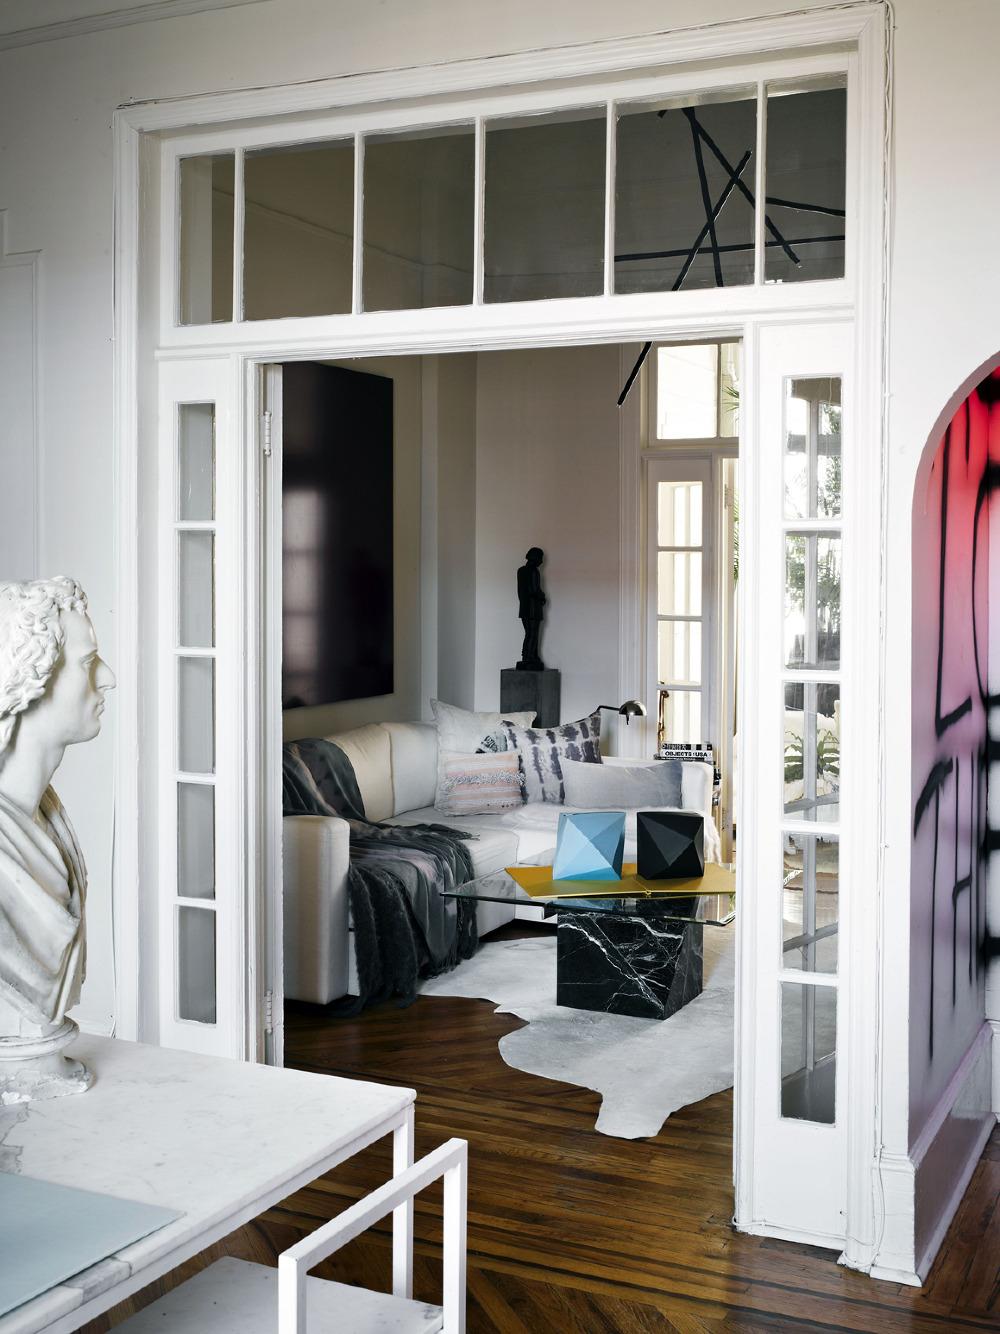 Loveisspeed kelly behun studio for brooklyn for Kelly behun studio